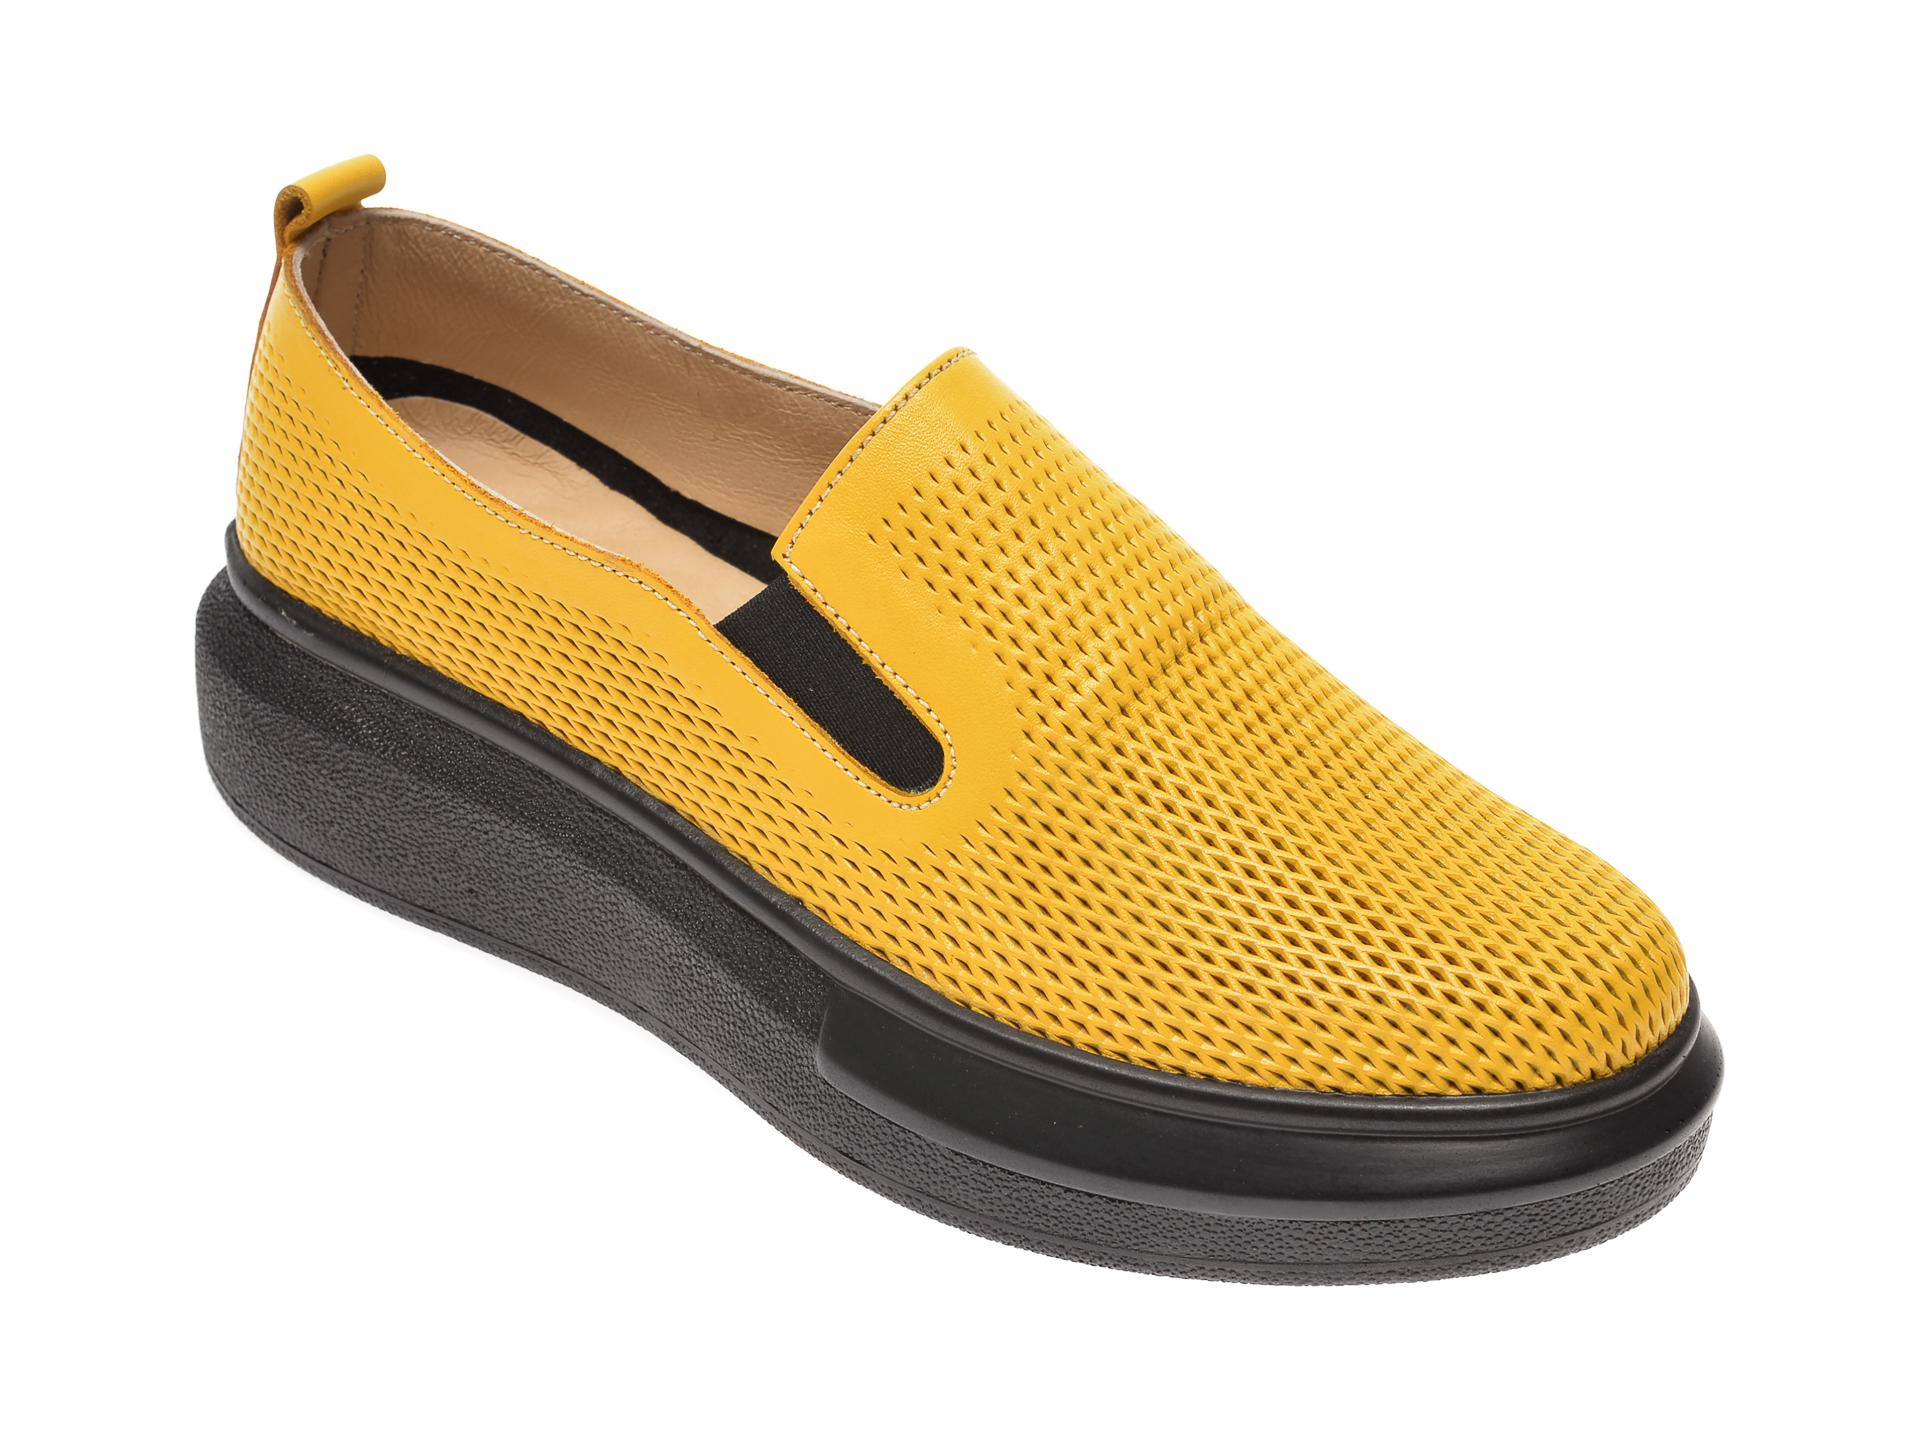 Pantofi PASS COLLECTION galbeni, K92102, din piele naturala